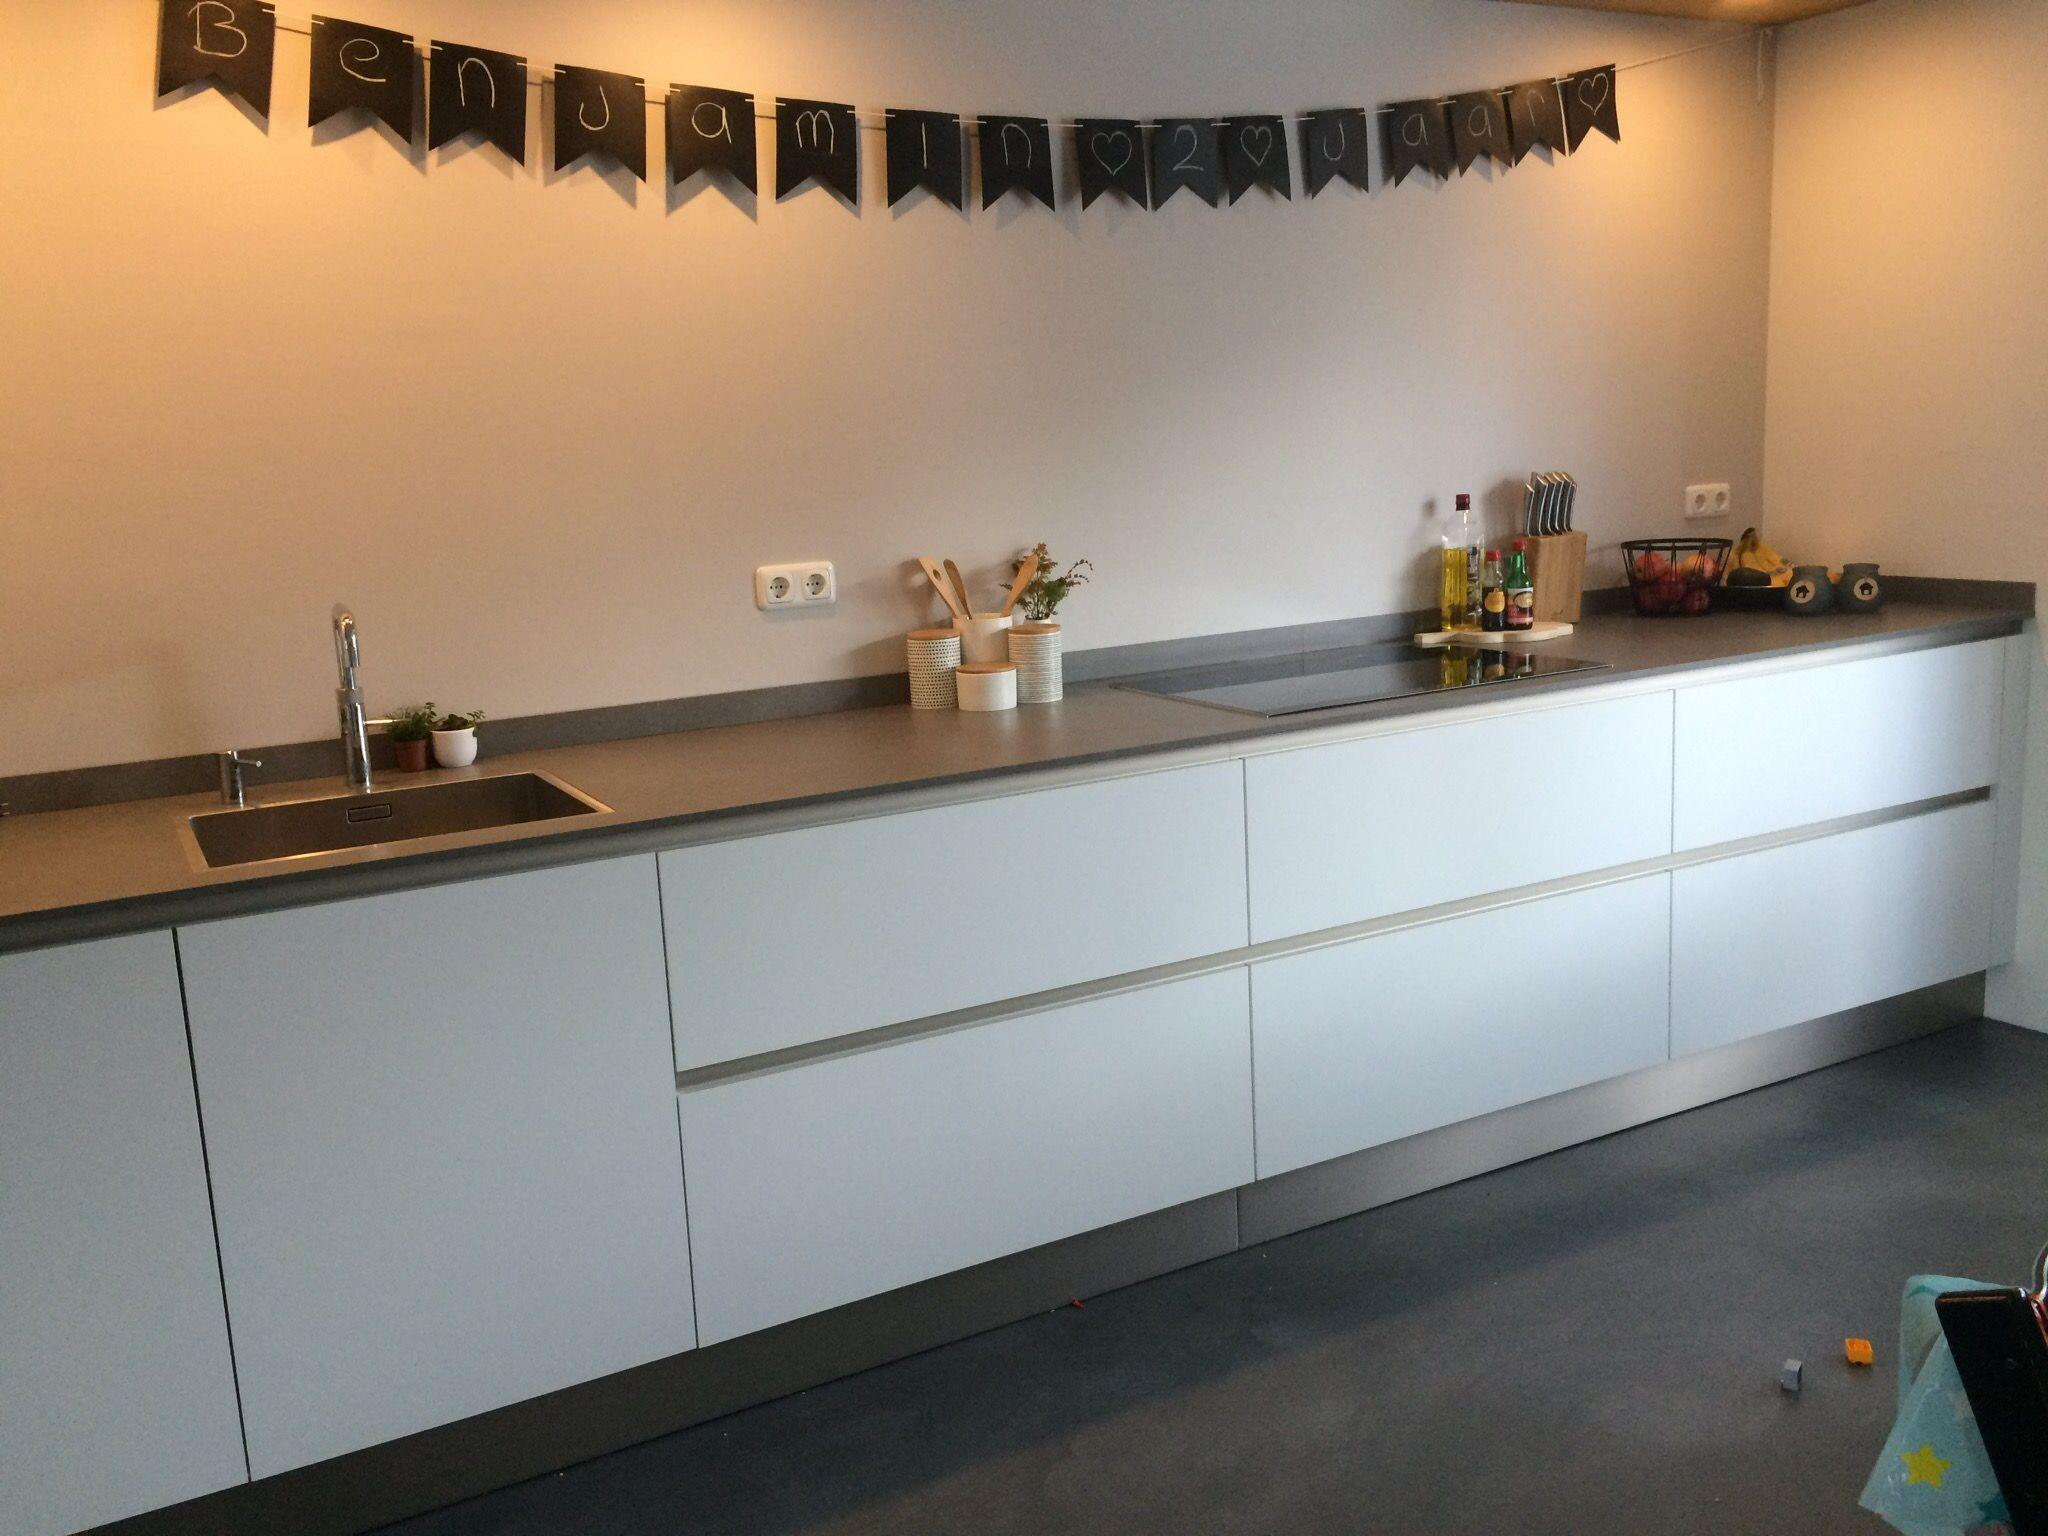 Ekelhoff Küchen ~ Witte keuken moderne keuken strakke keuken dun aanrechtblad